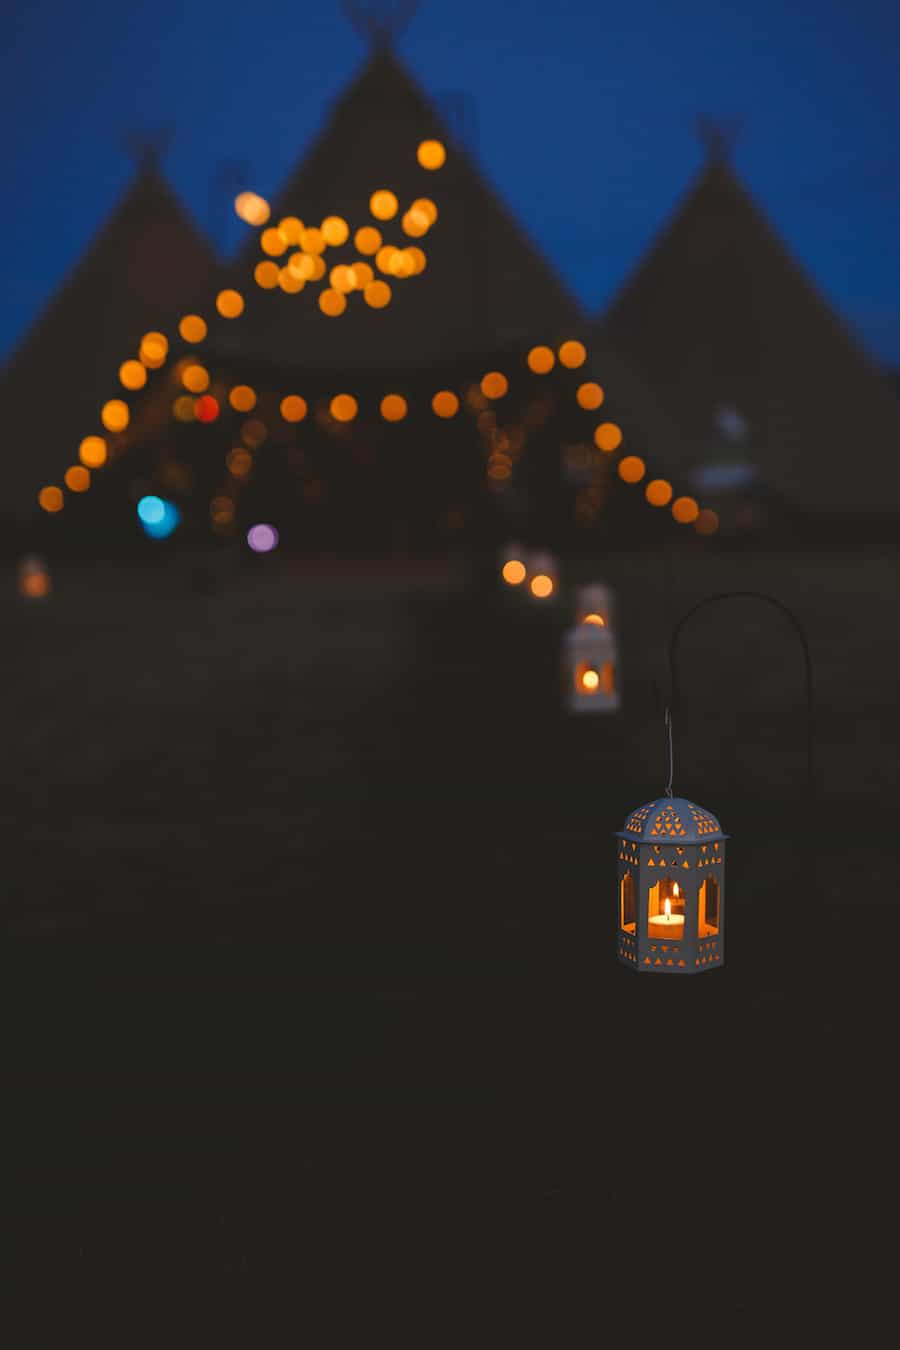 festoon and lantern light tipi walkway at night